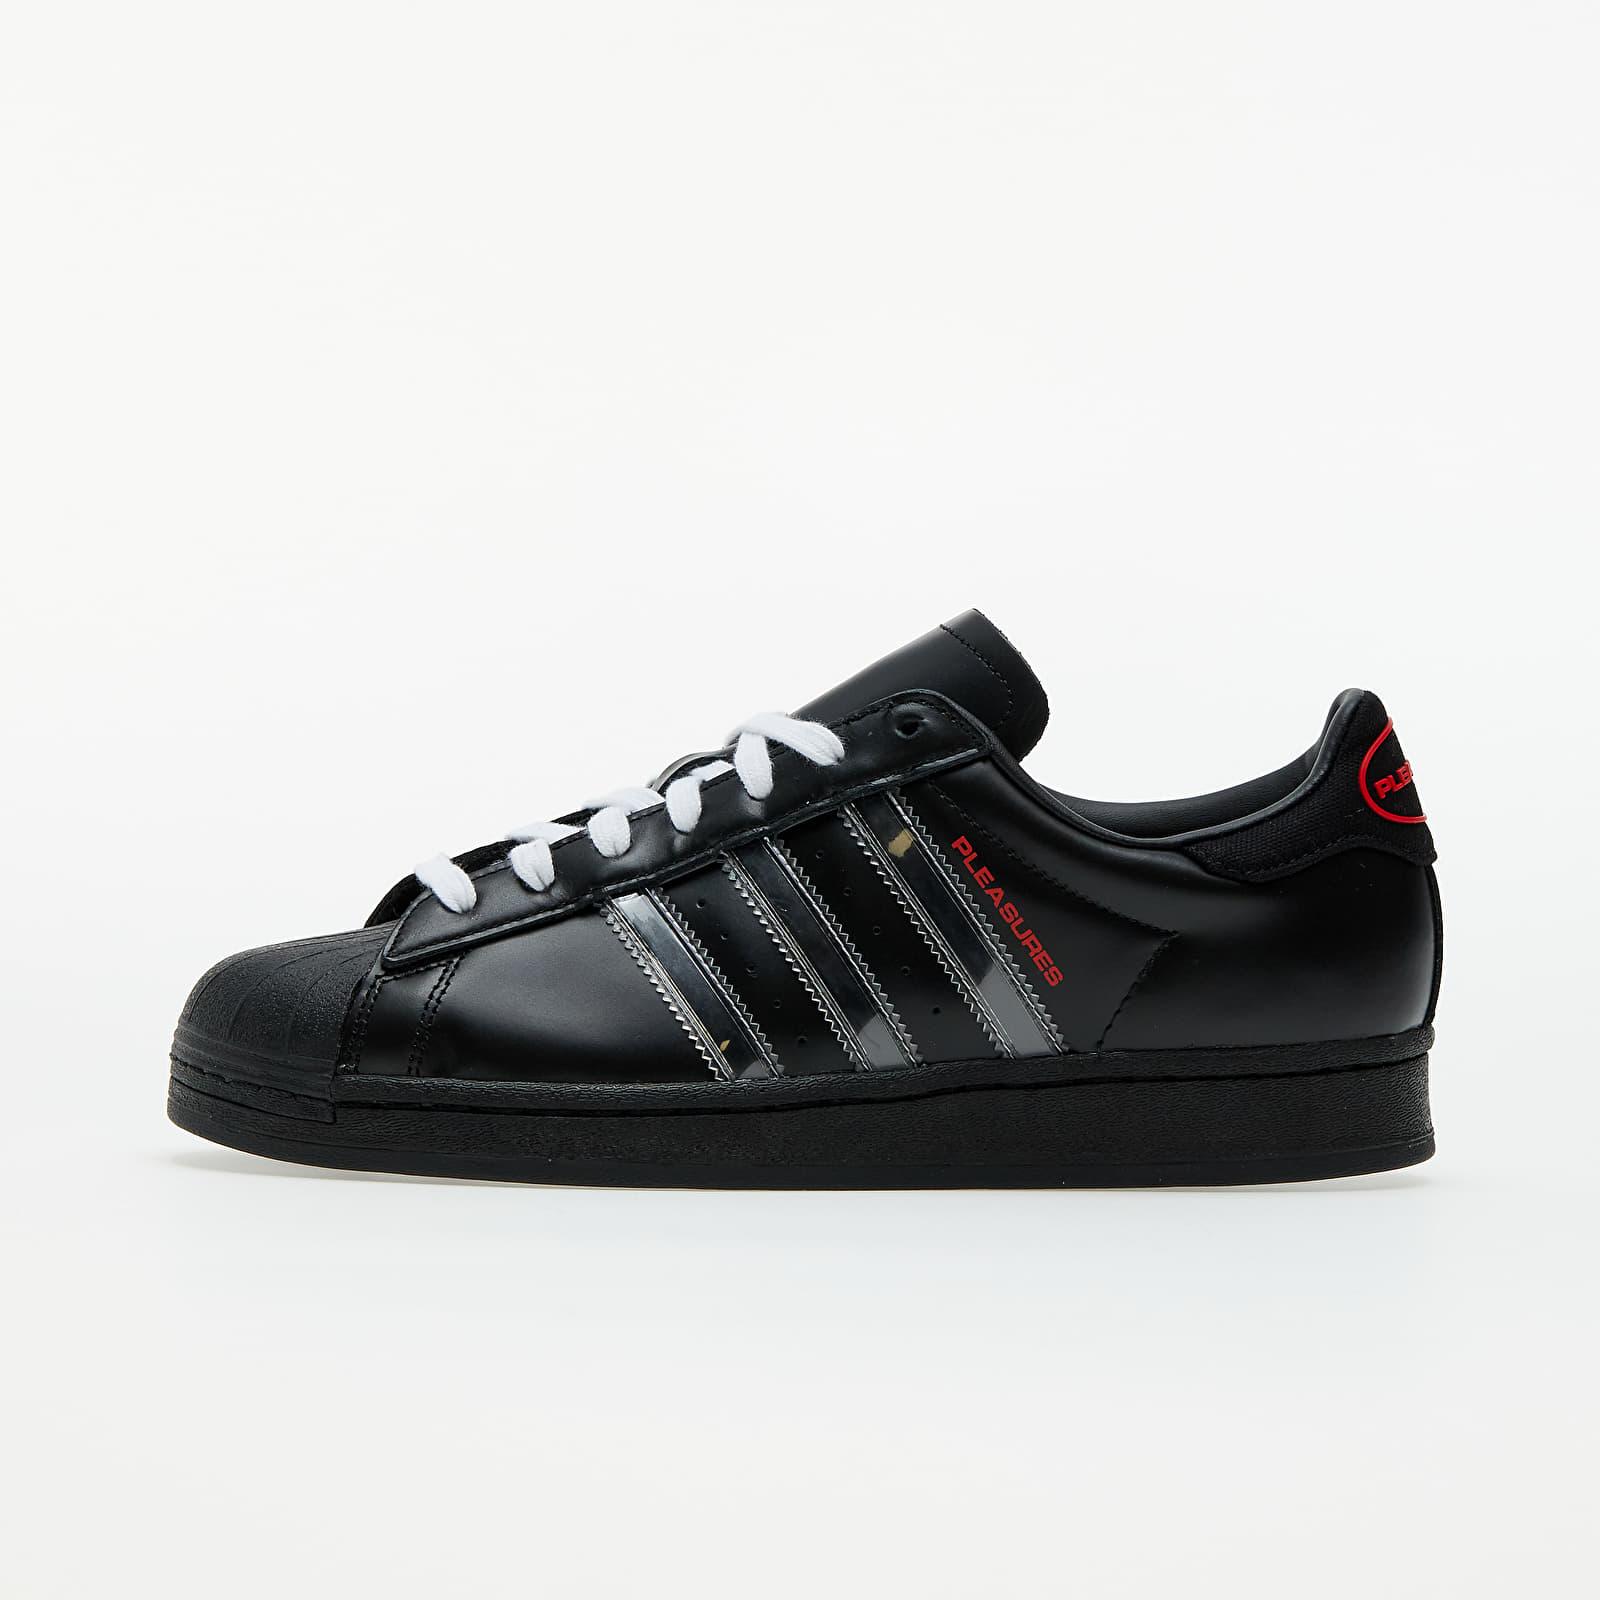 adidas x Pleasures Superstar Core Black/ Ftwr White/ Red EUR 36